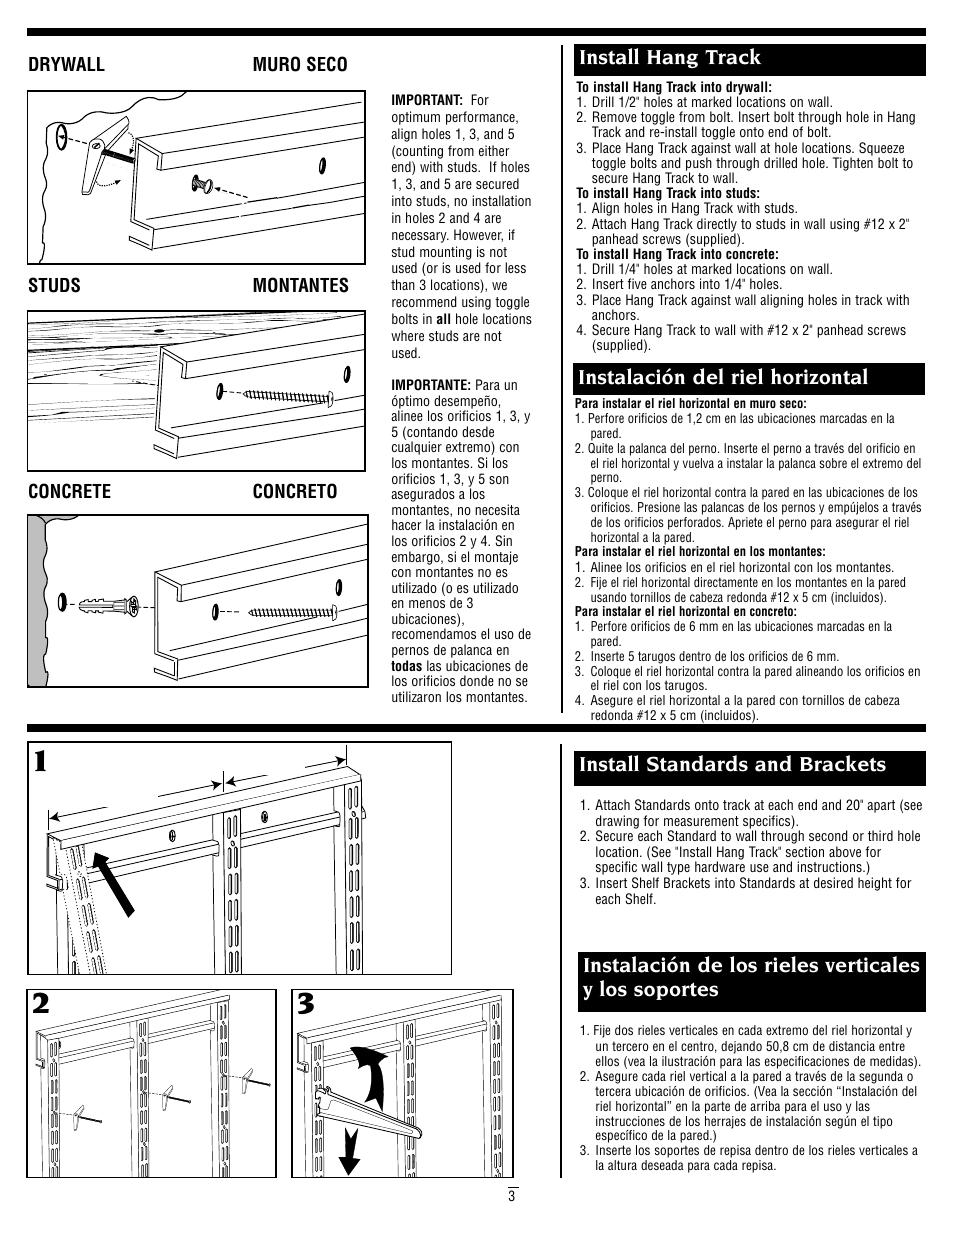 Install Hang Track, Instalación Del Riel Horizontal | Closet Maid 2894 User  Manual | Page